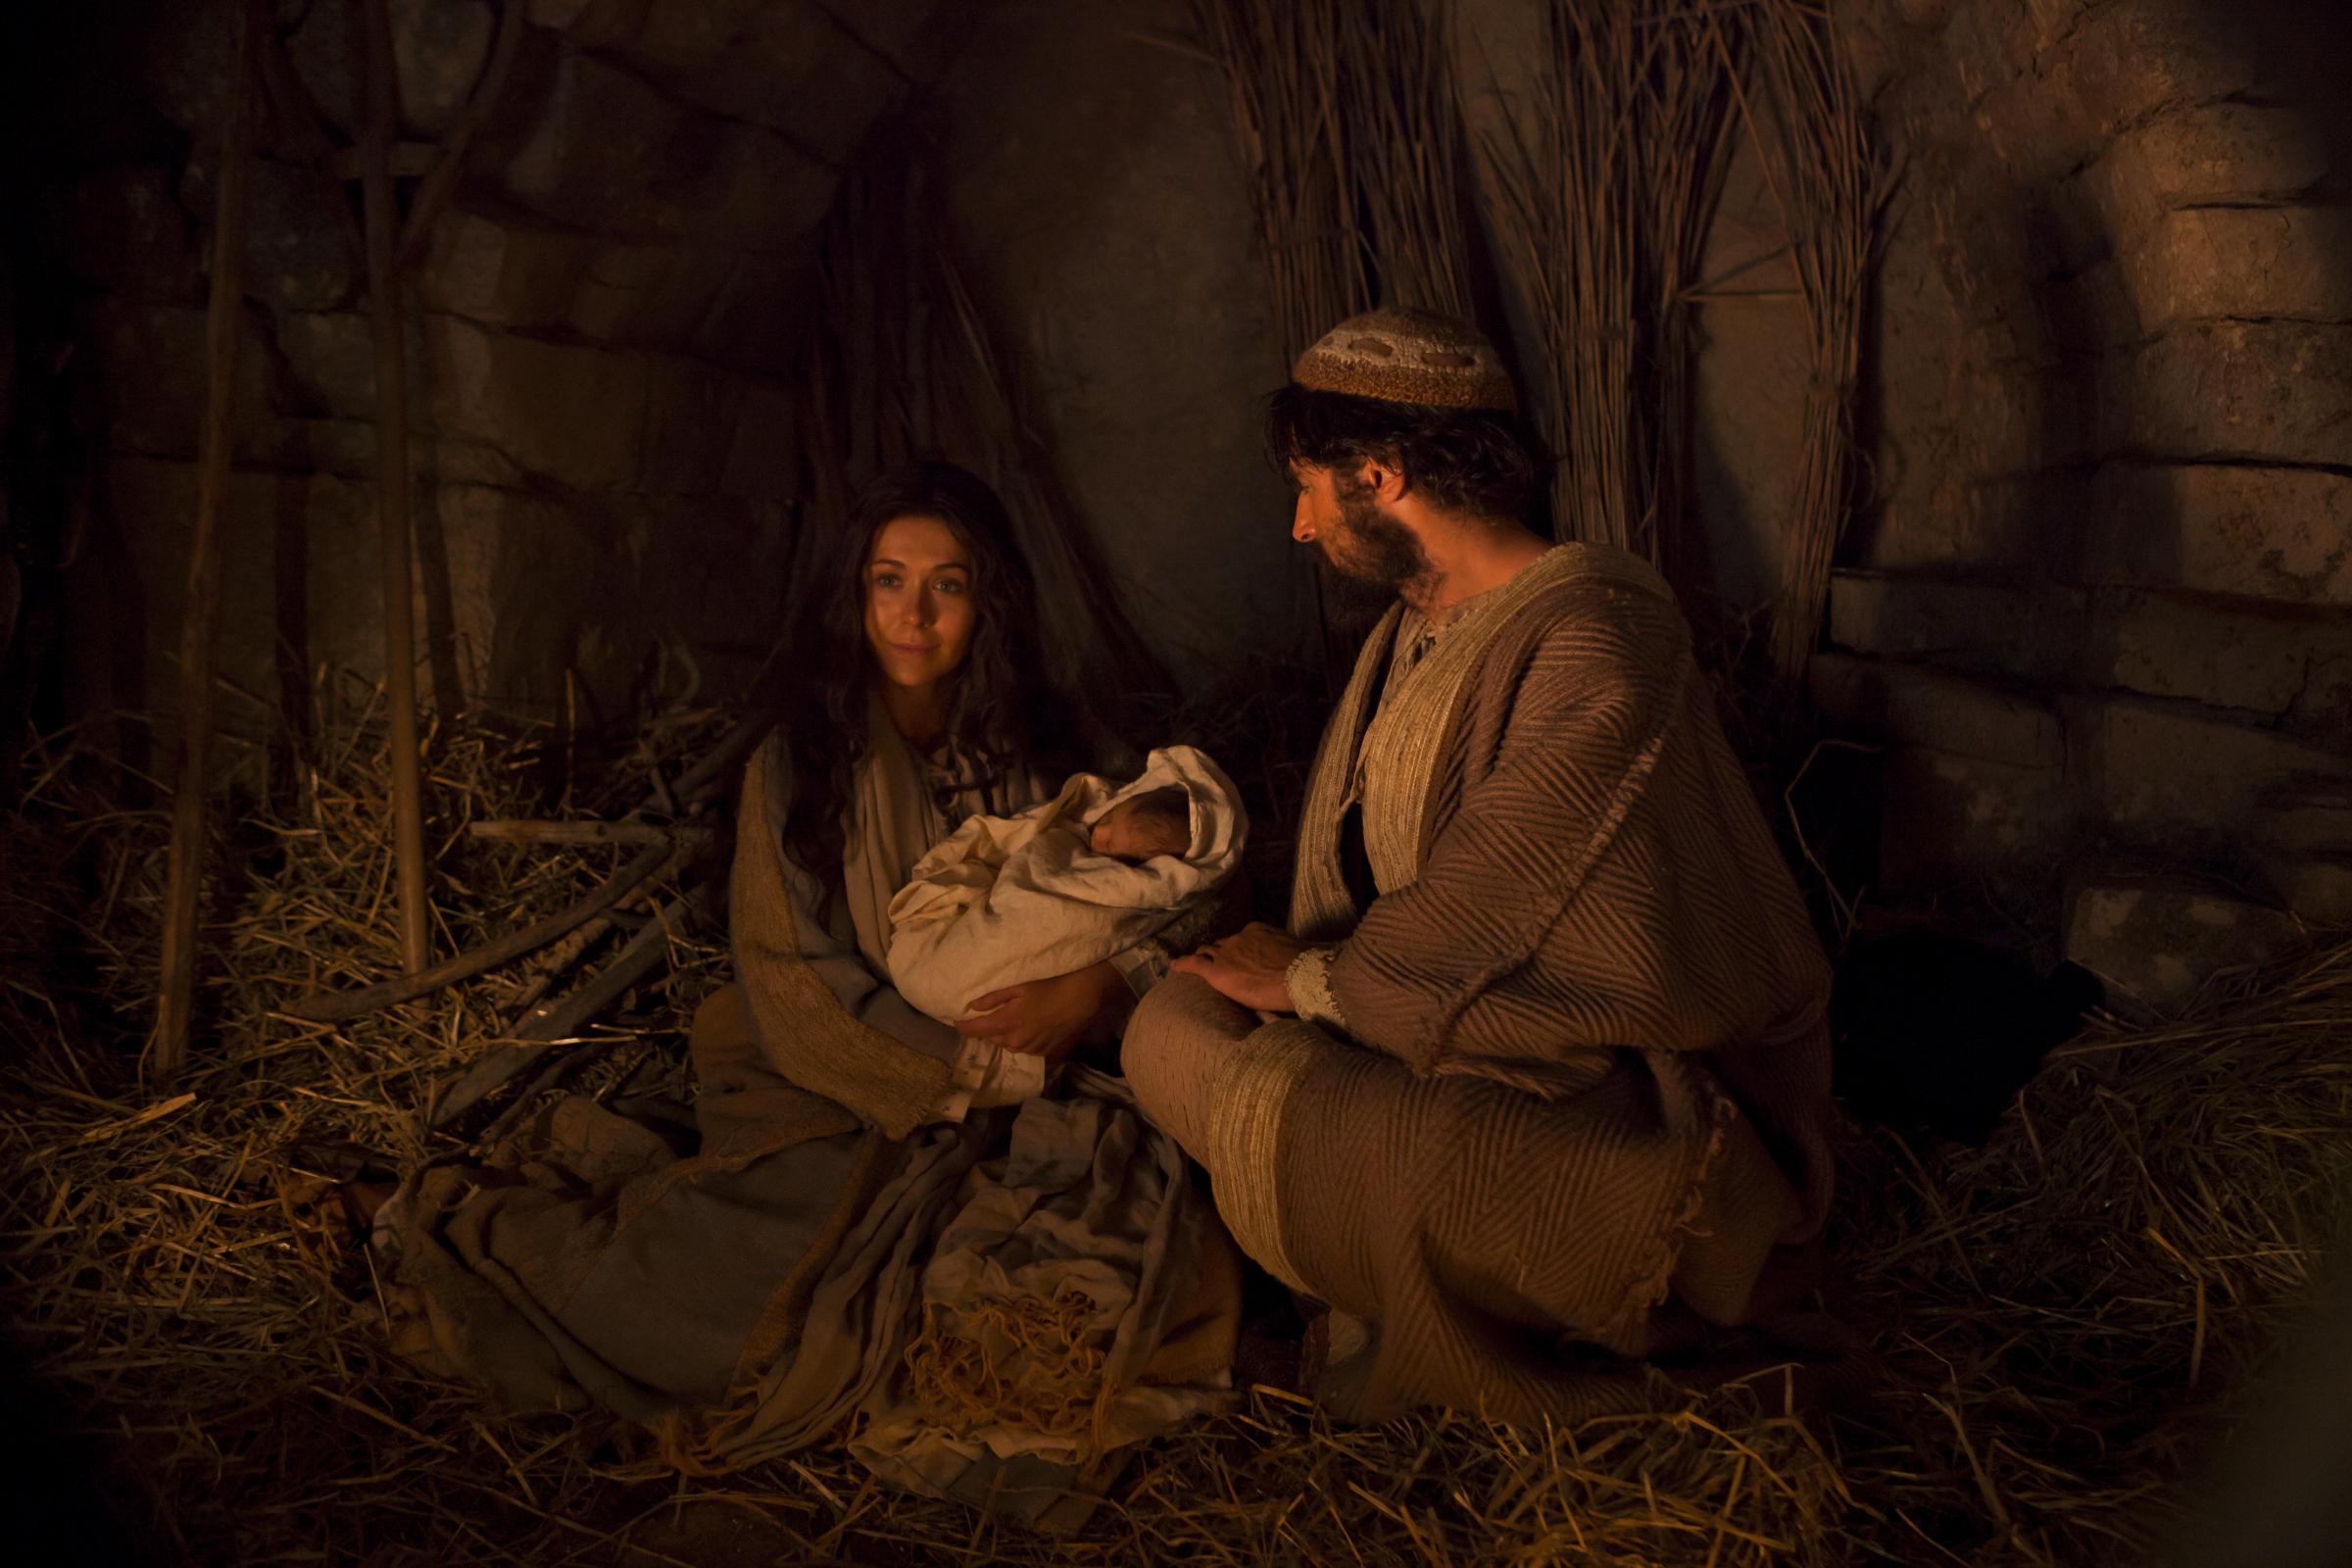 nativity jesus christ lds wallpaper - photo #1